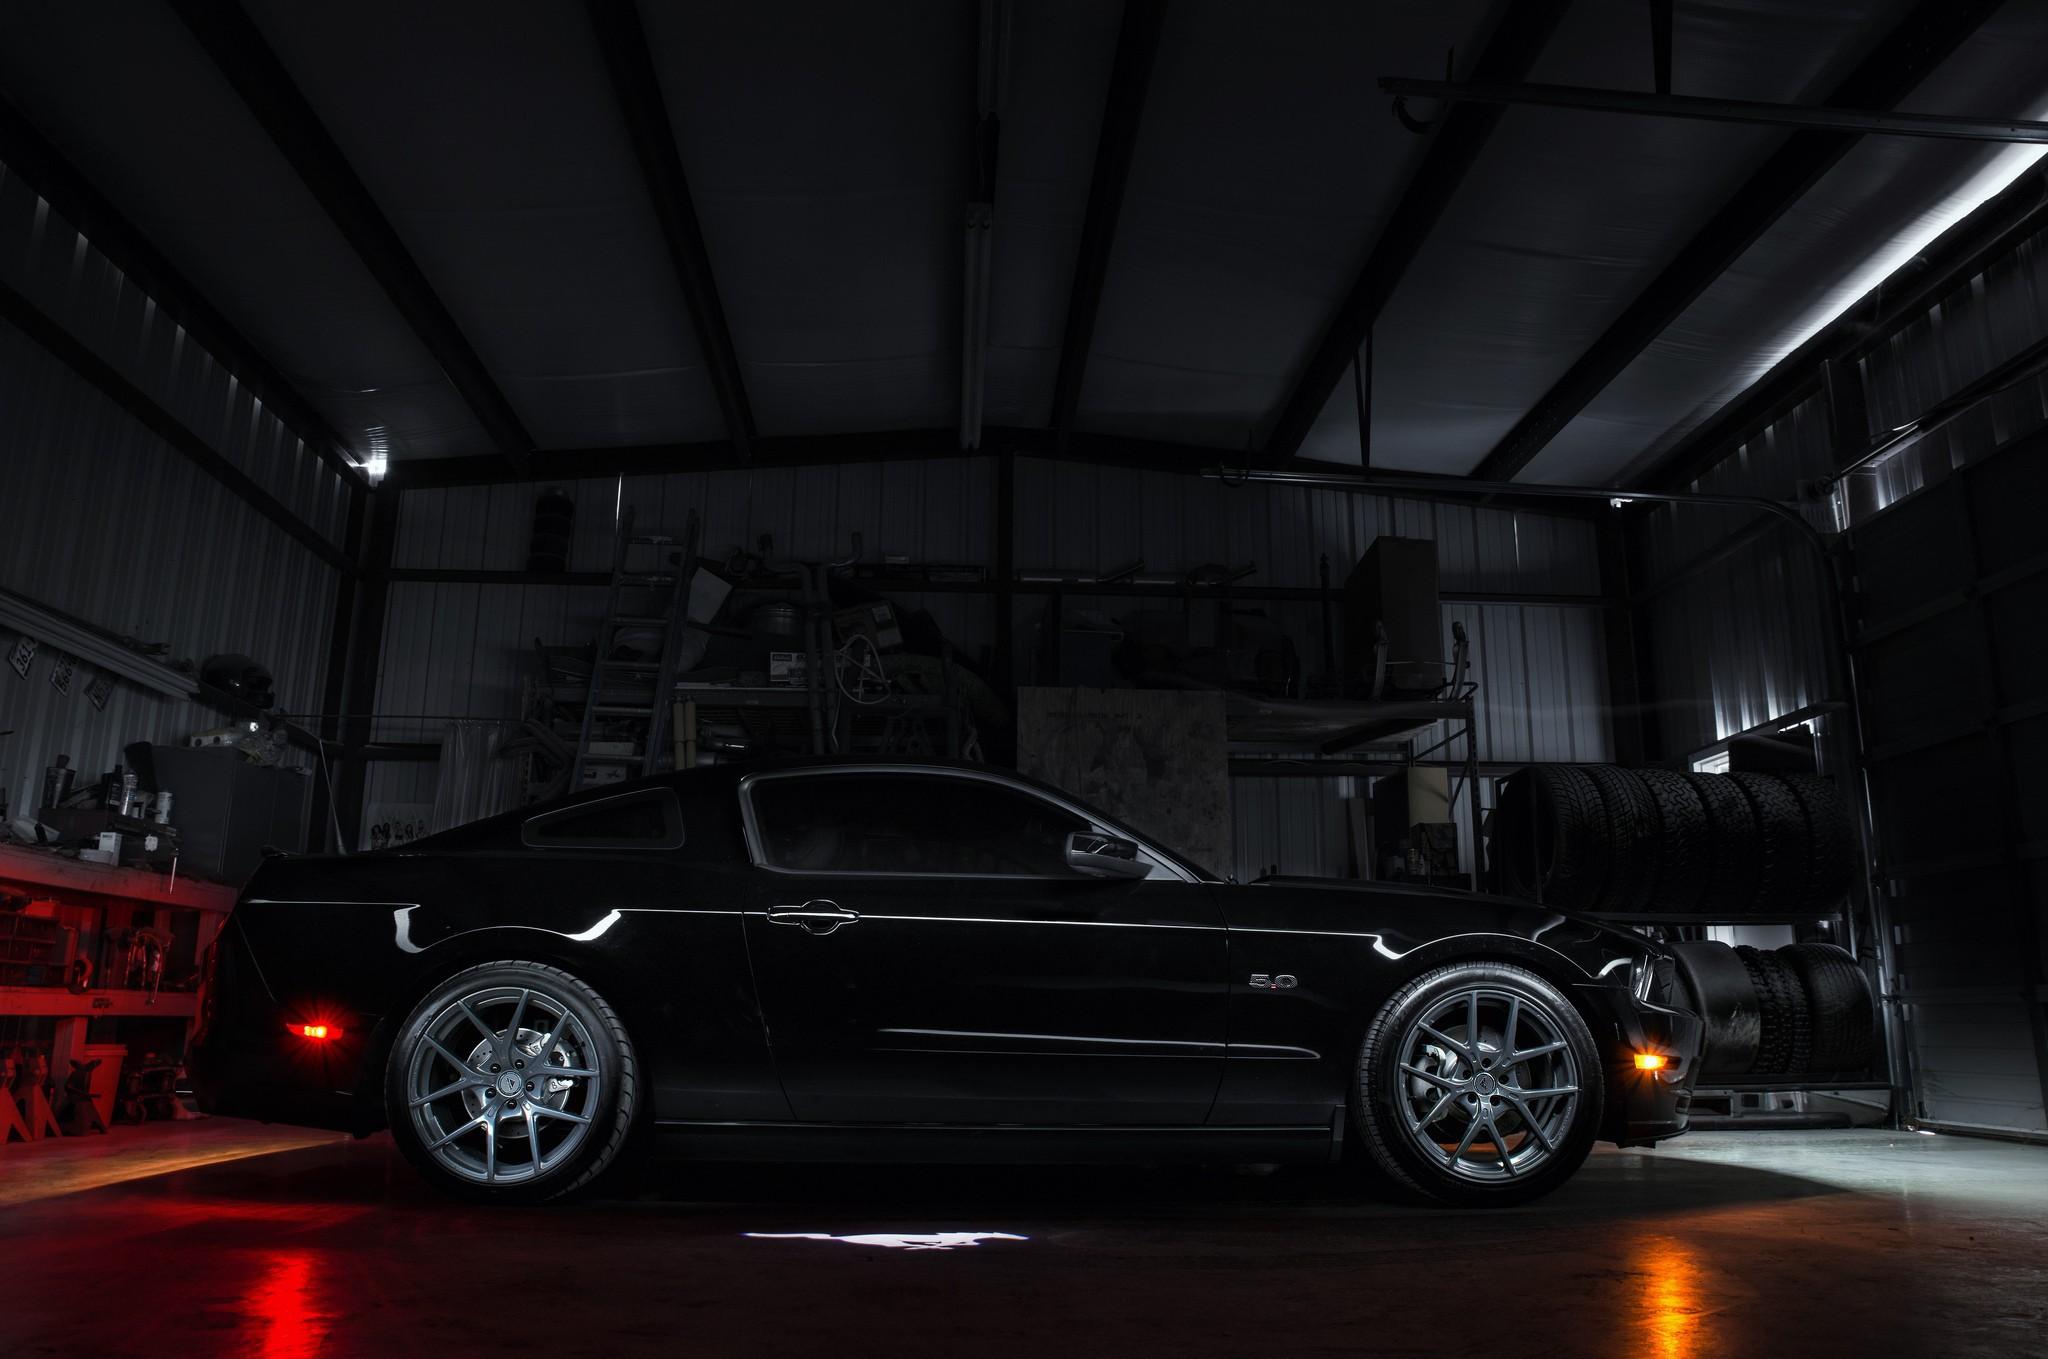 Картинки авто в гараже